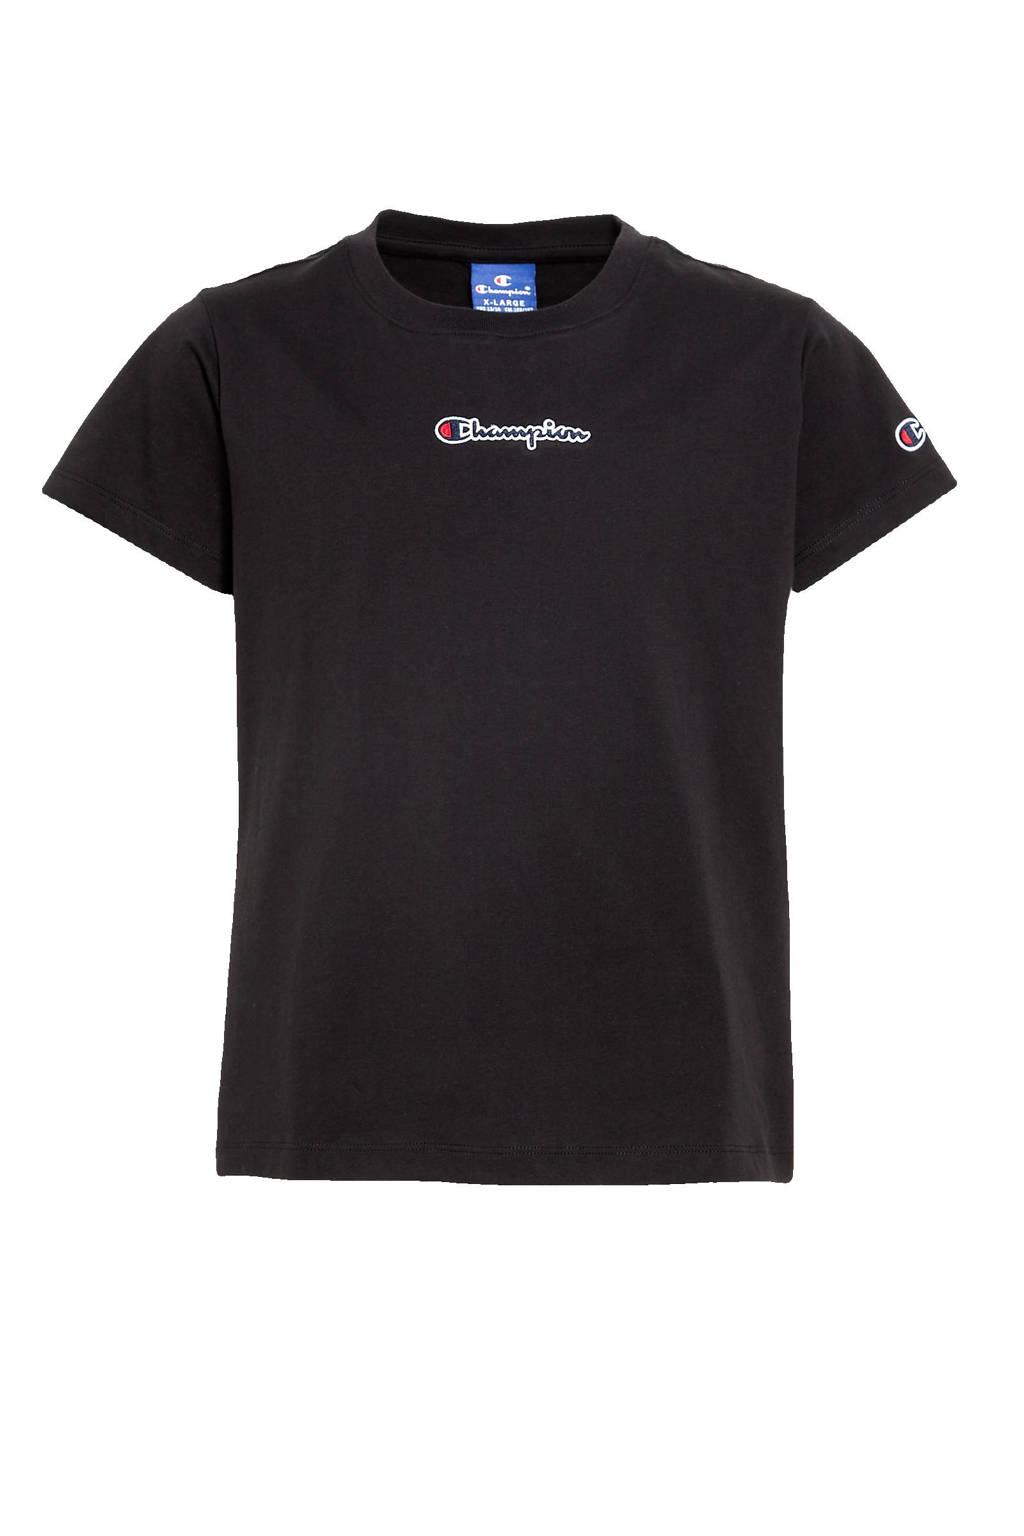 Champion T-shirt met logo zwart, Zwart